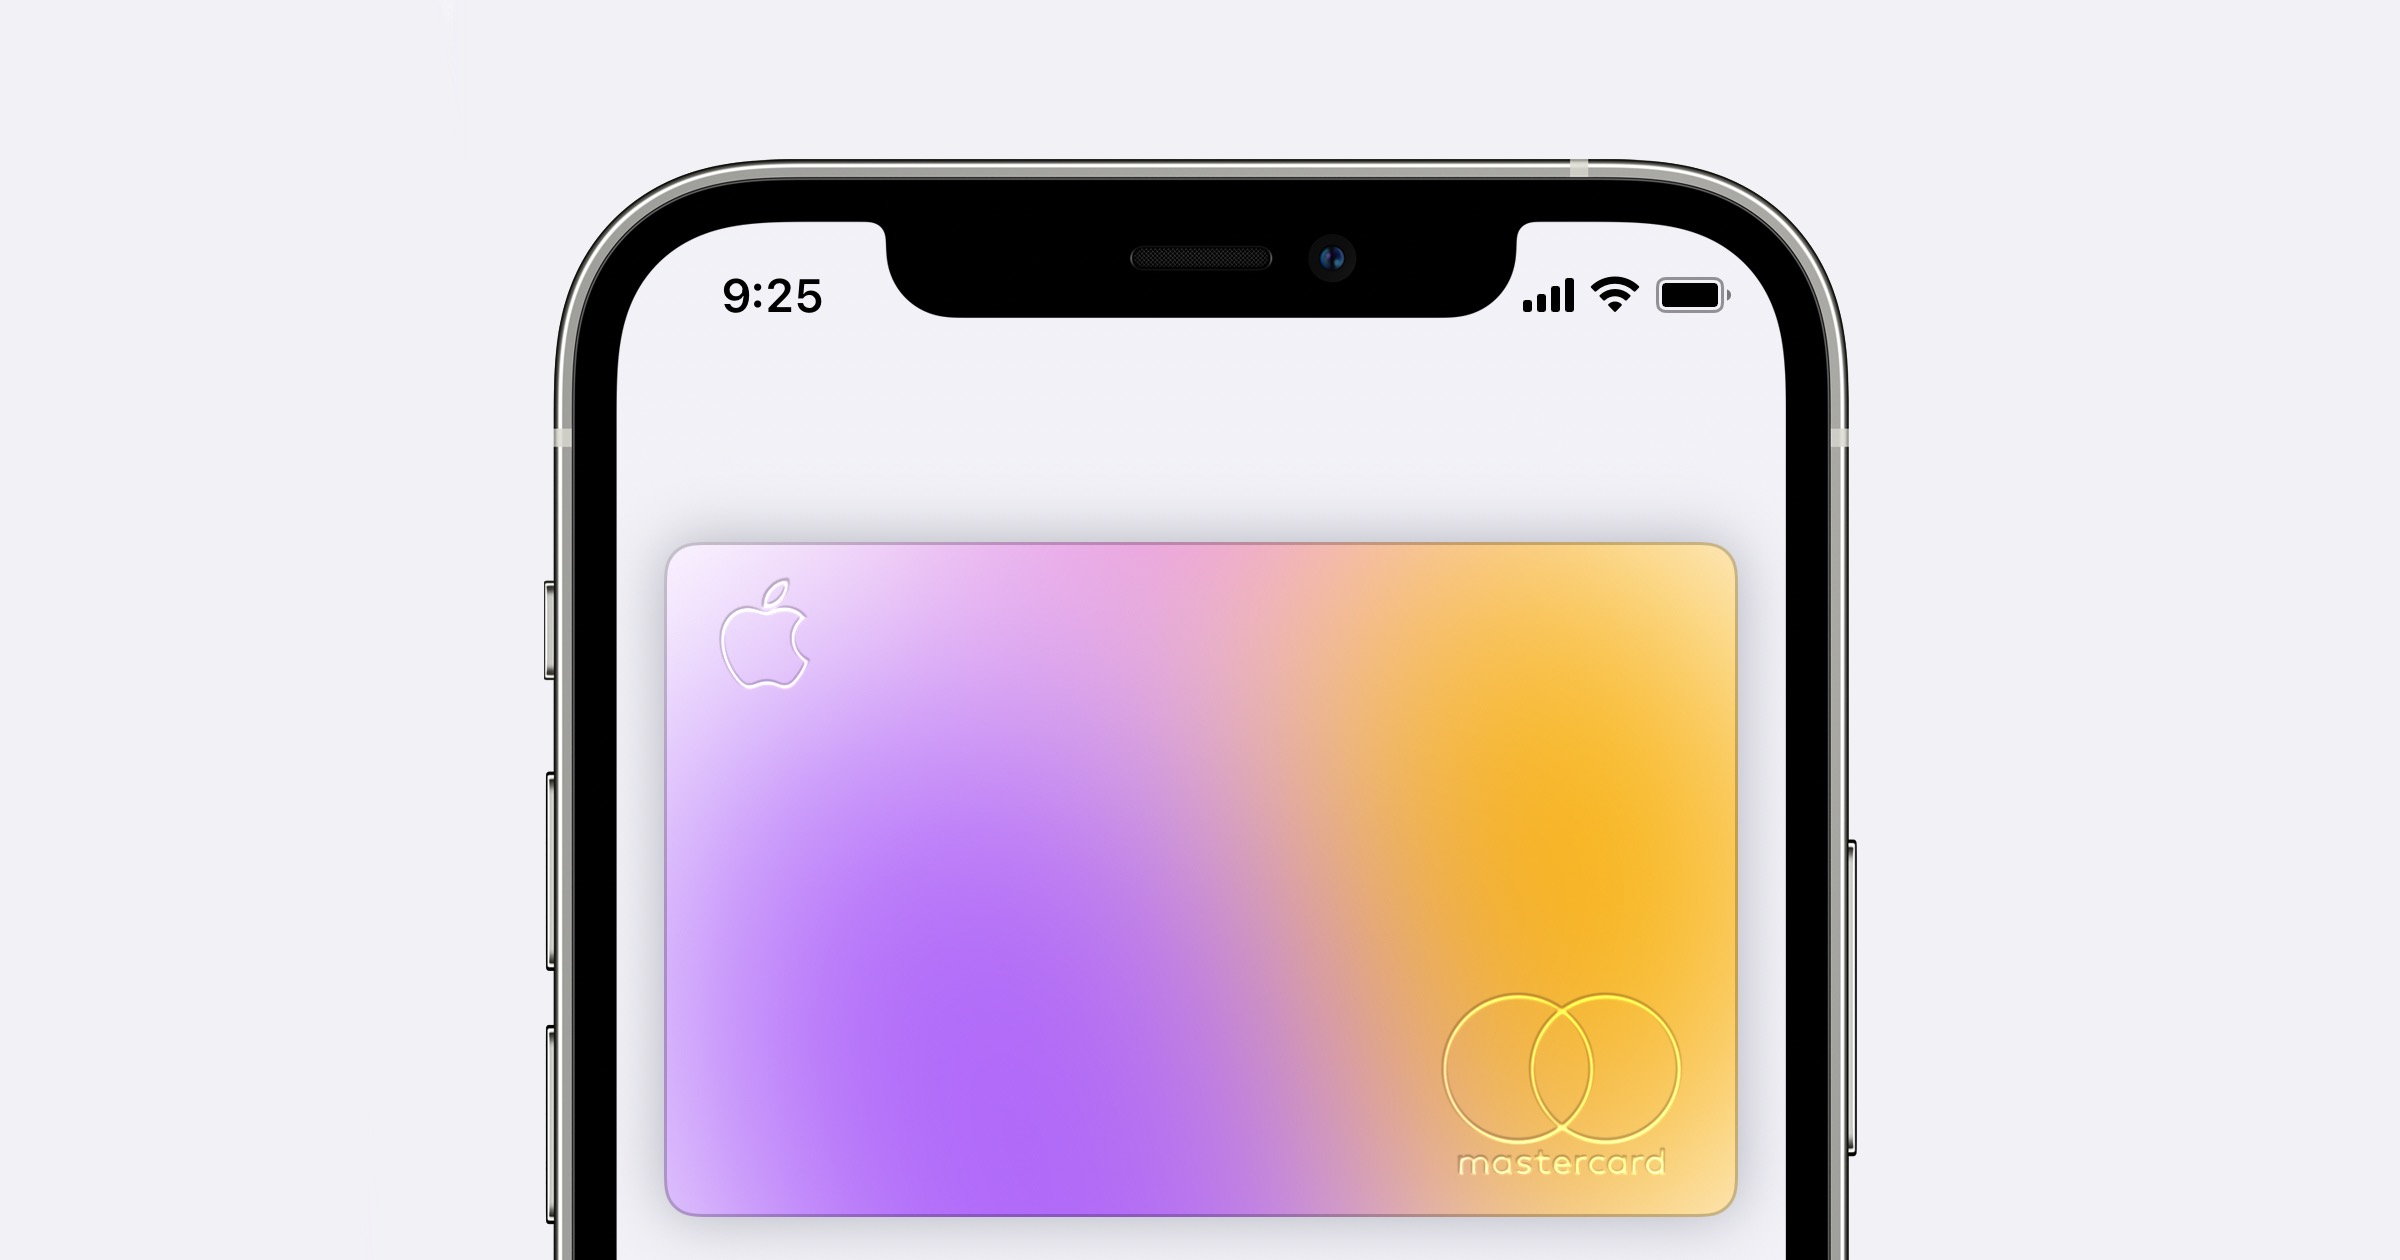 Apple Card displayed on iPhone 12.